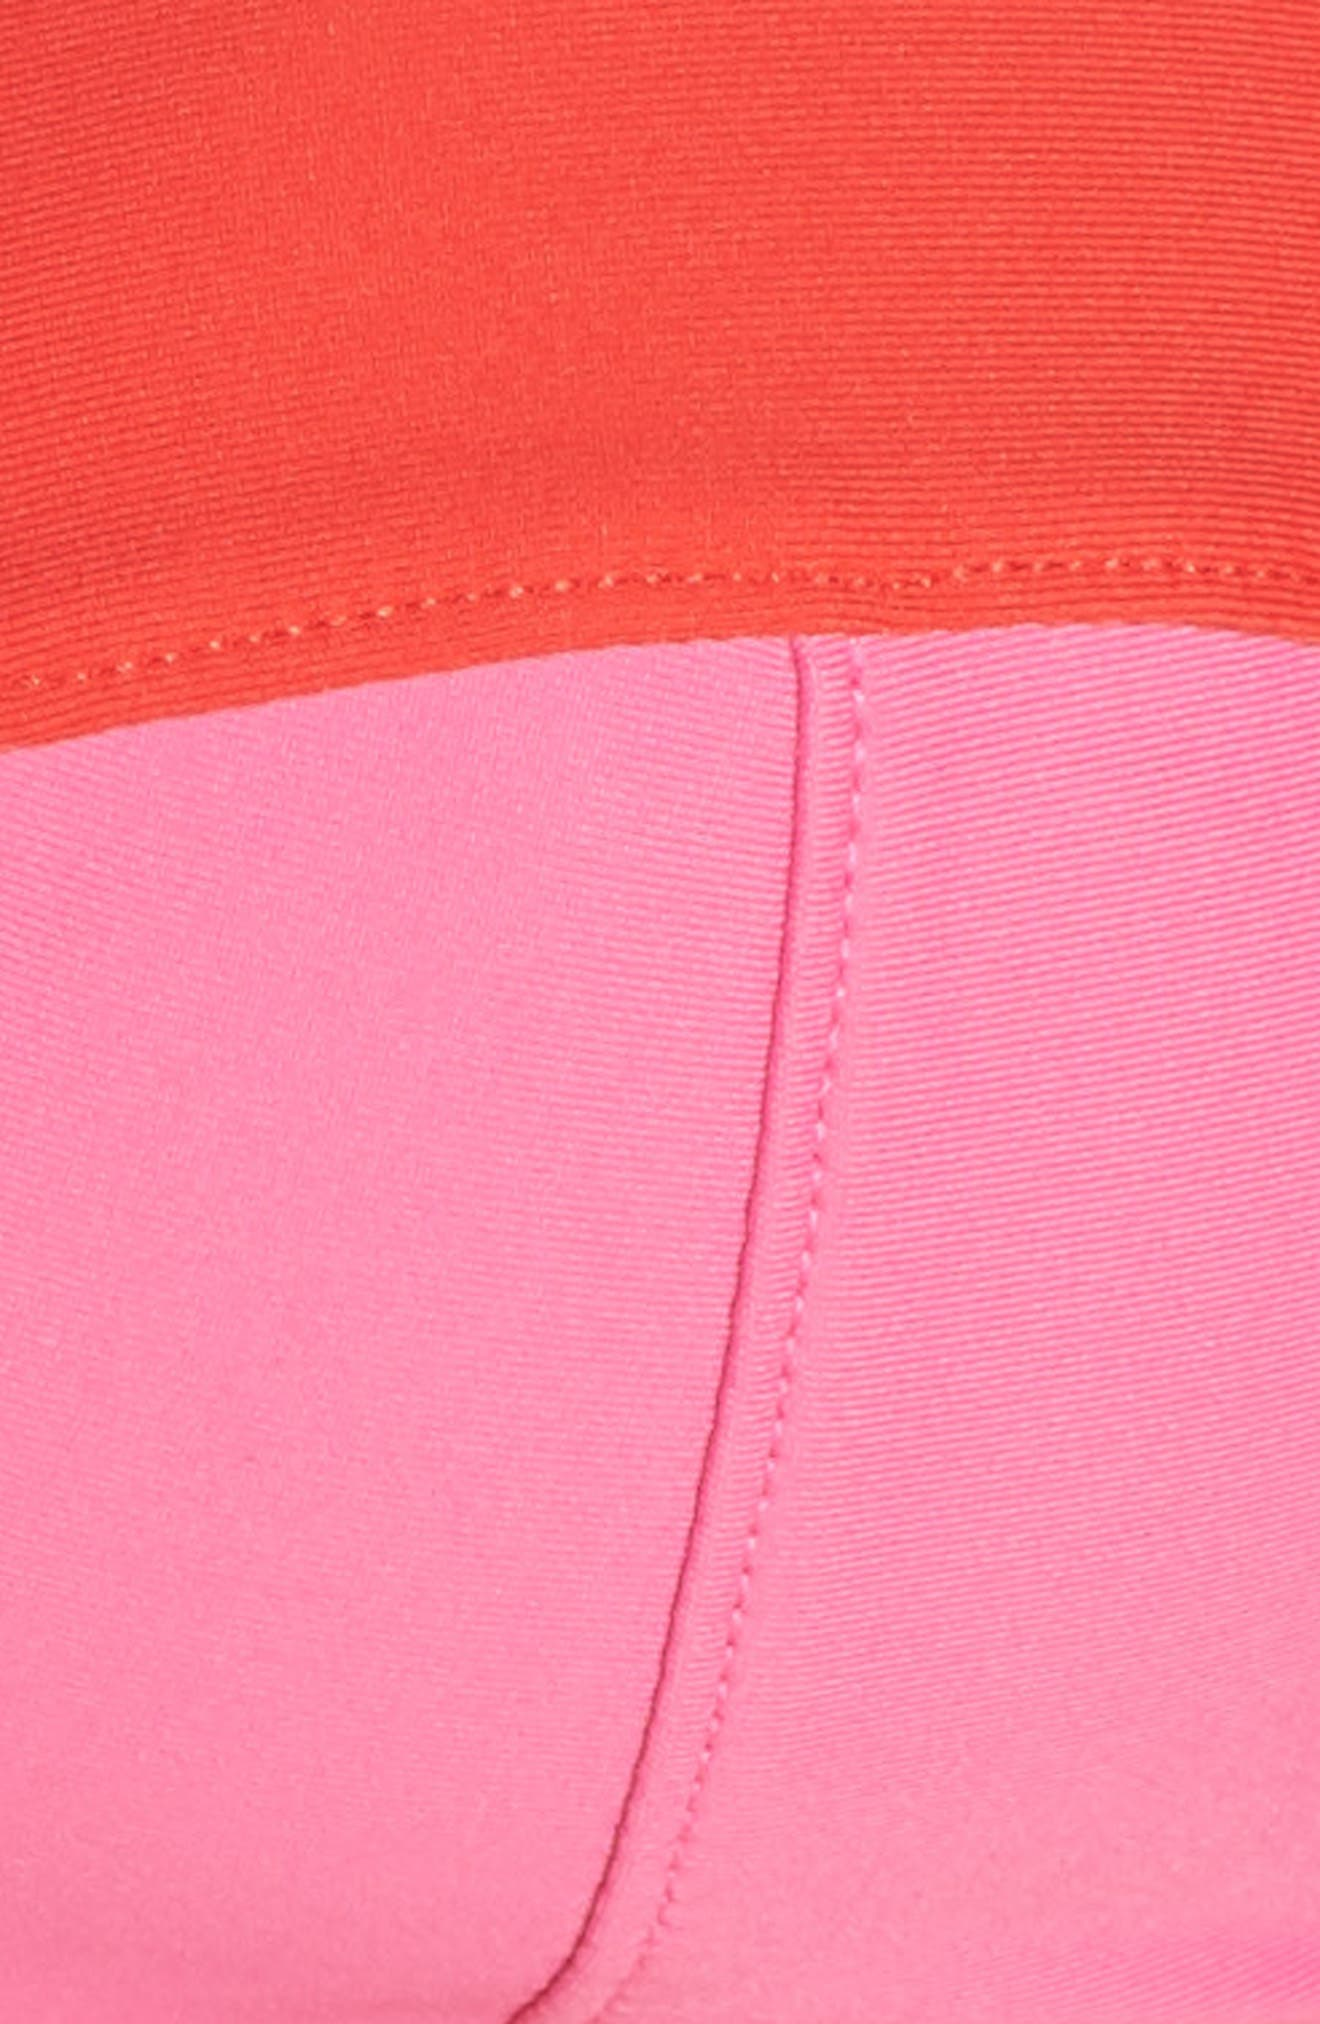 Colorblock Underwire Bikini Top,                             Alternate thumbnail 6, color,                             MINT CERISE PINK